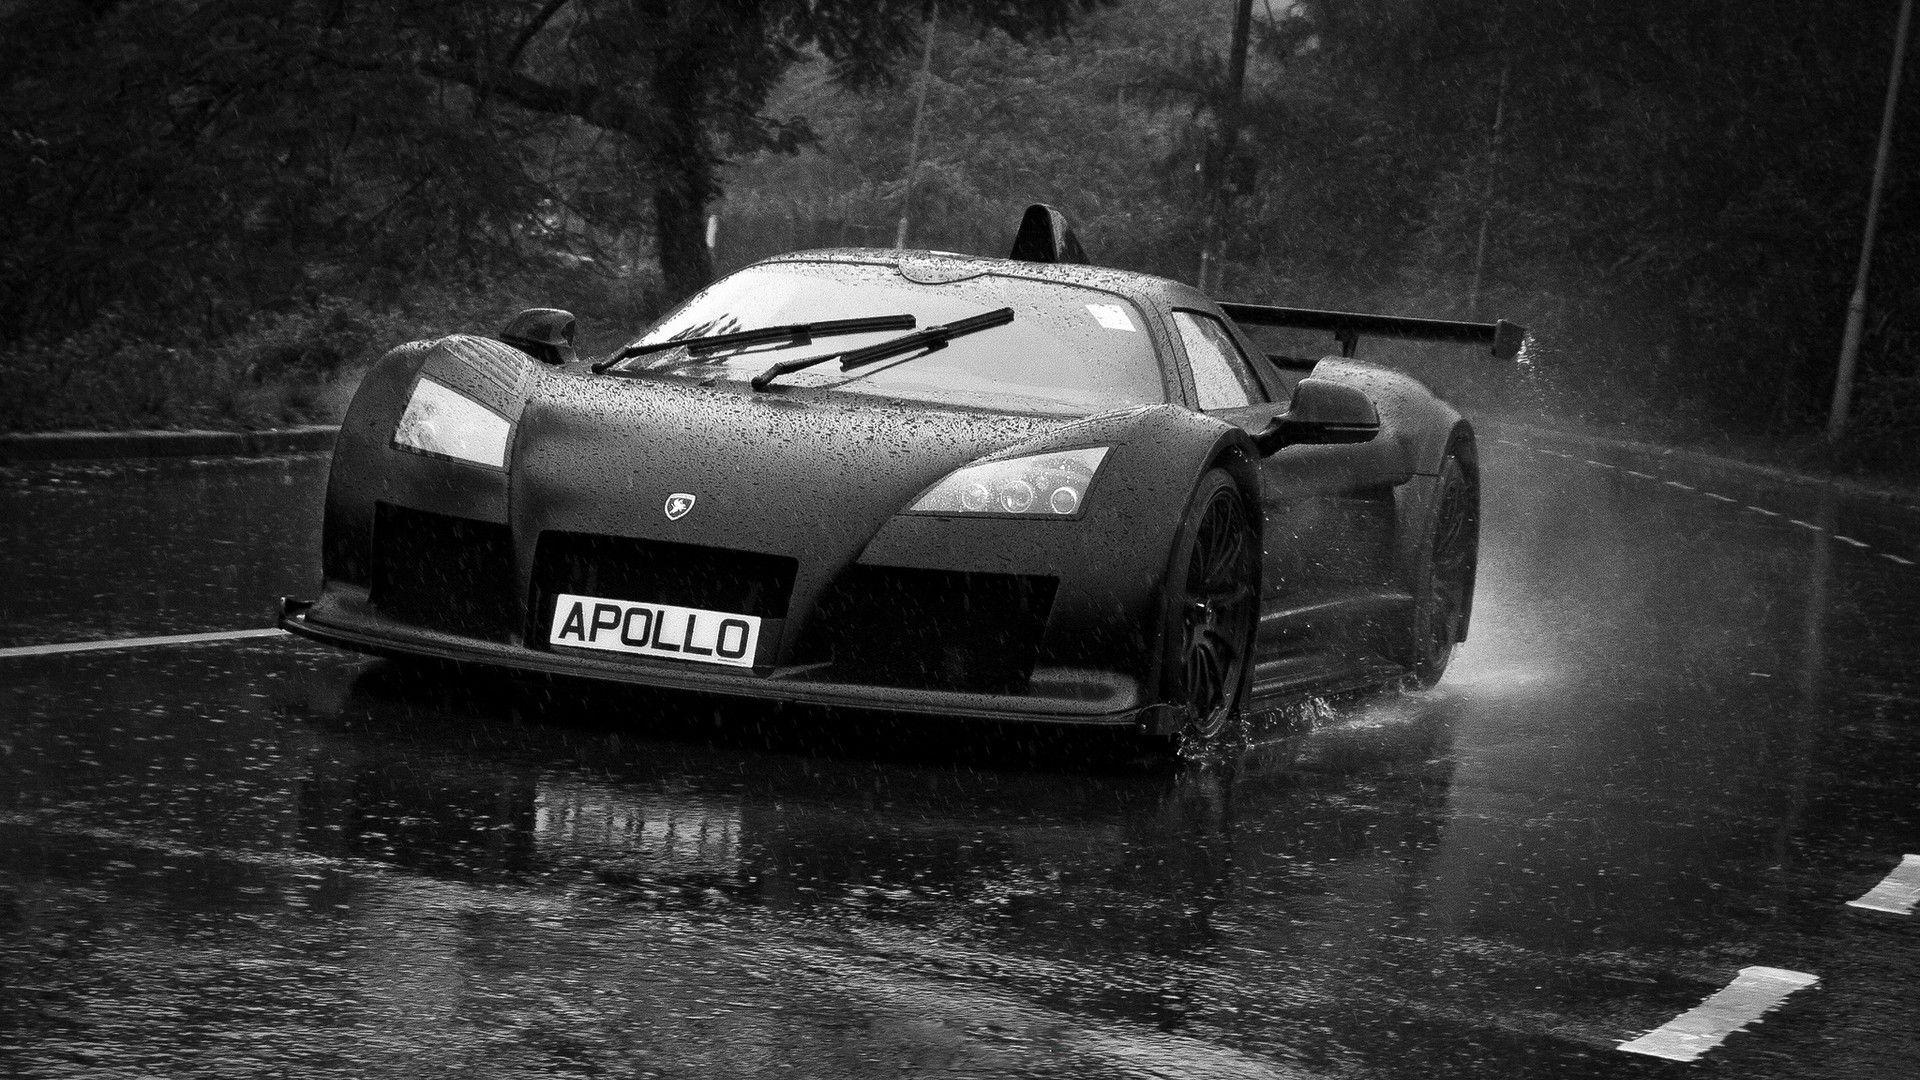 Rain Car Hd Wallpapers 1080p Cars With Images Car Hd Rain Car